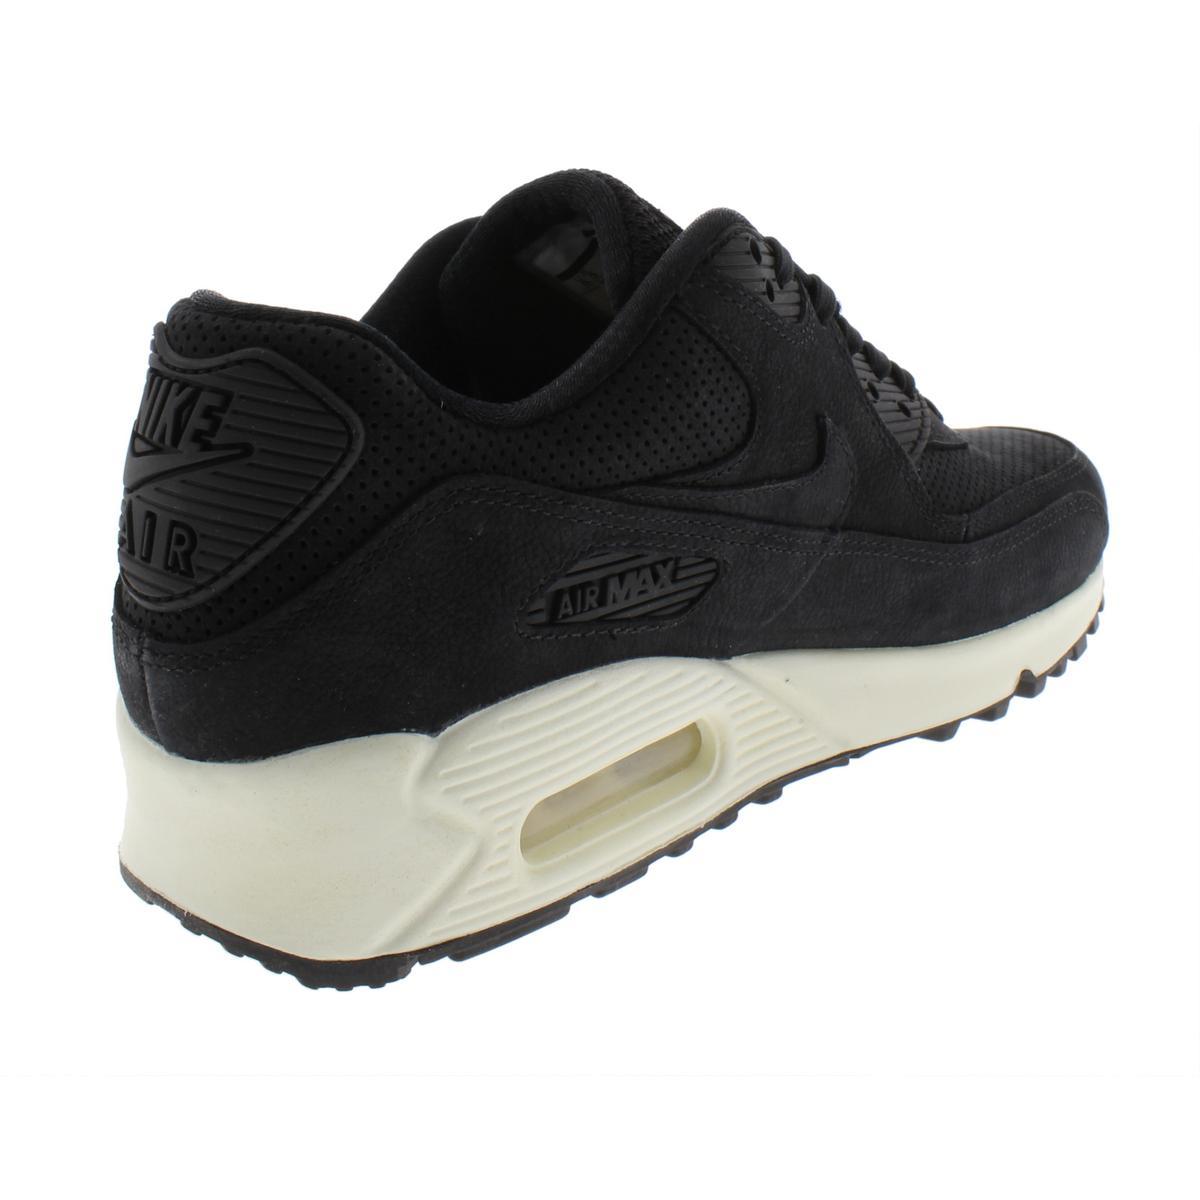 Nike-Womens-Air-Max-90-Pinnacle-Suede-Low-Top-Fashion-Sneakers-Shoes-BHFO-4140 thumbnail 4